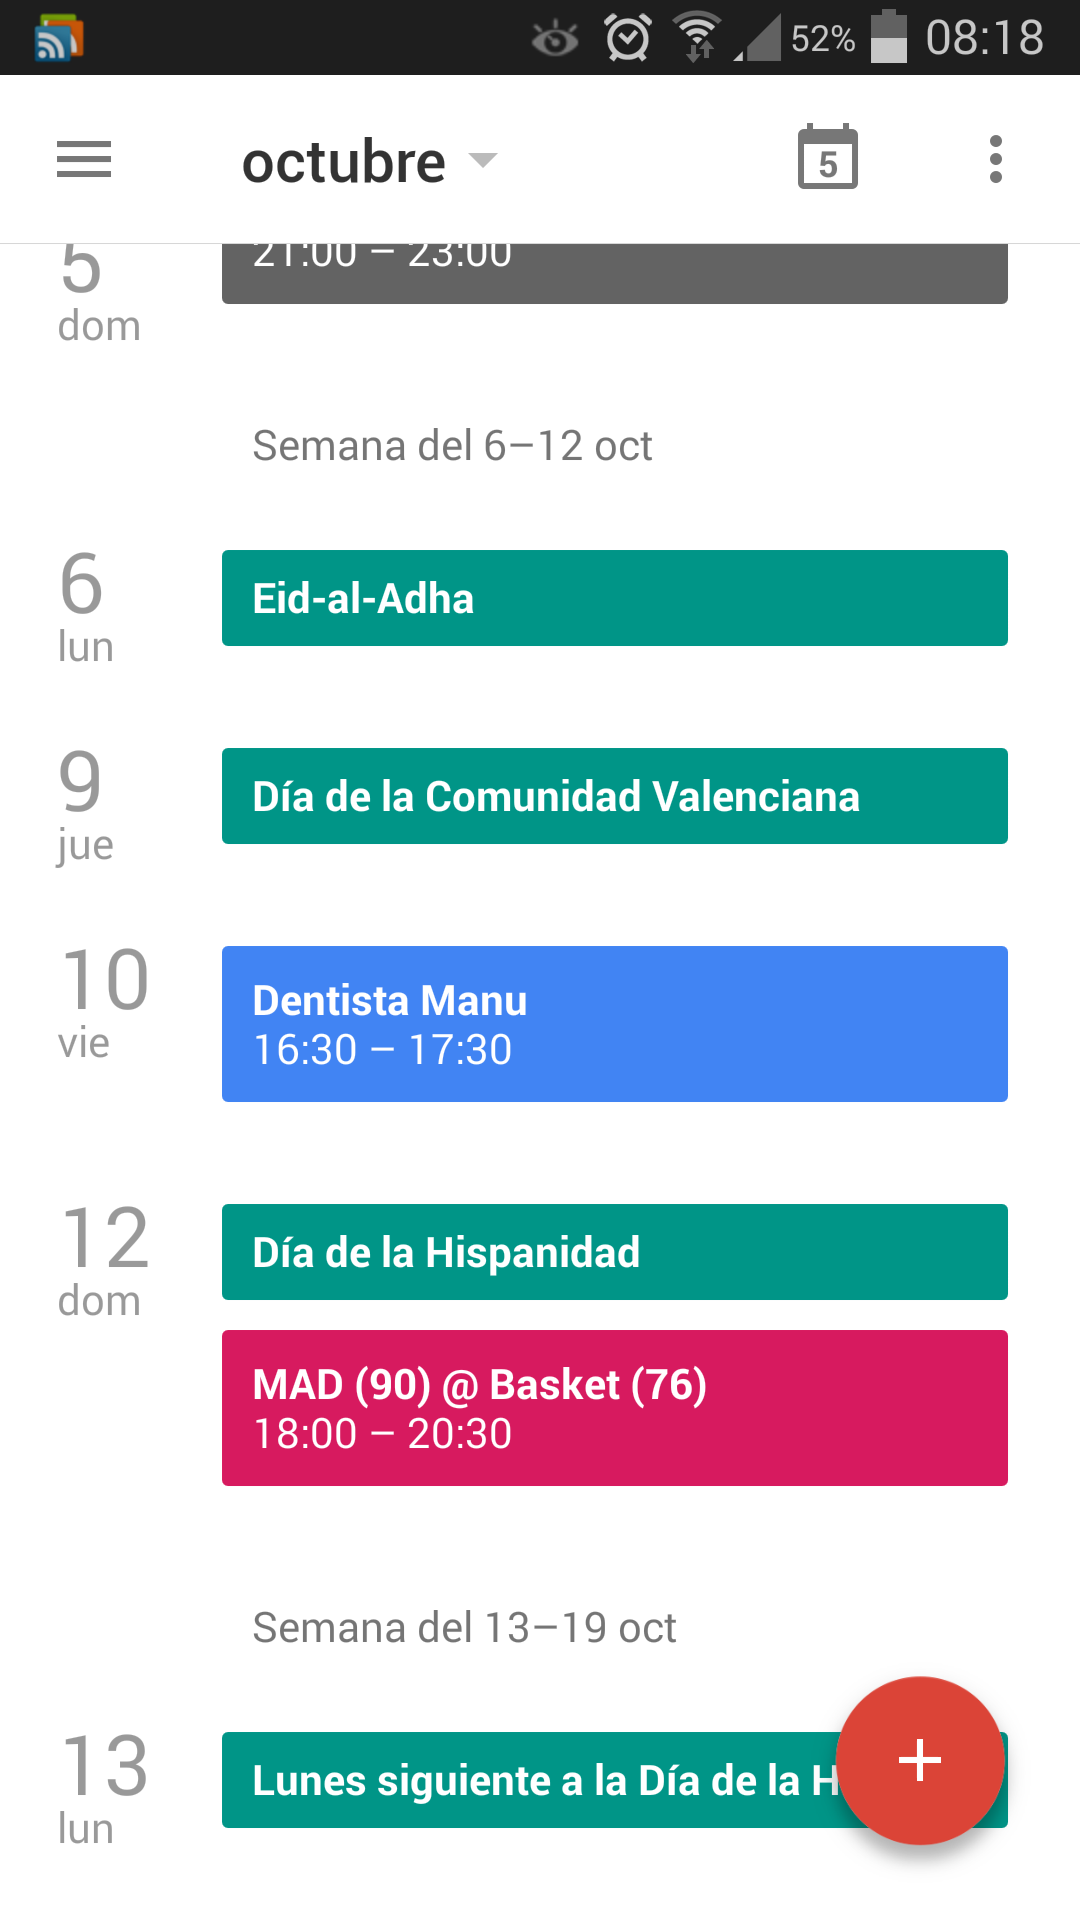 Nueva interfaz de Google Calendar 5.0